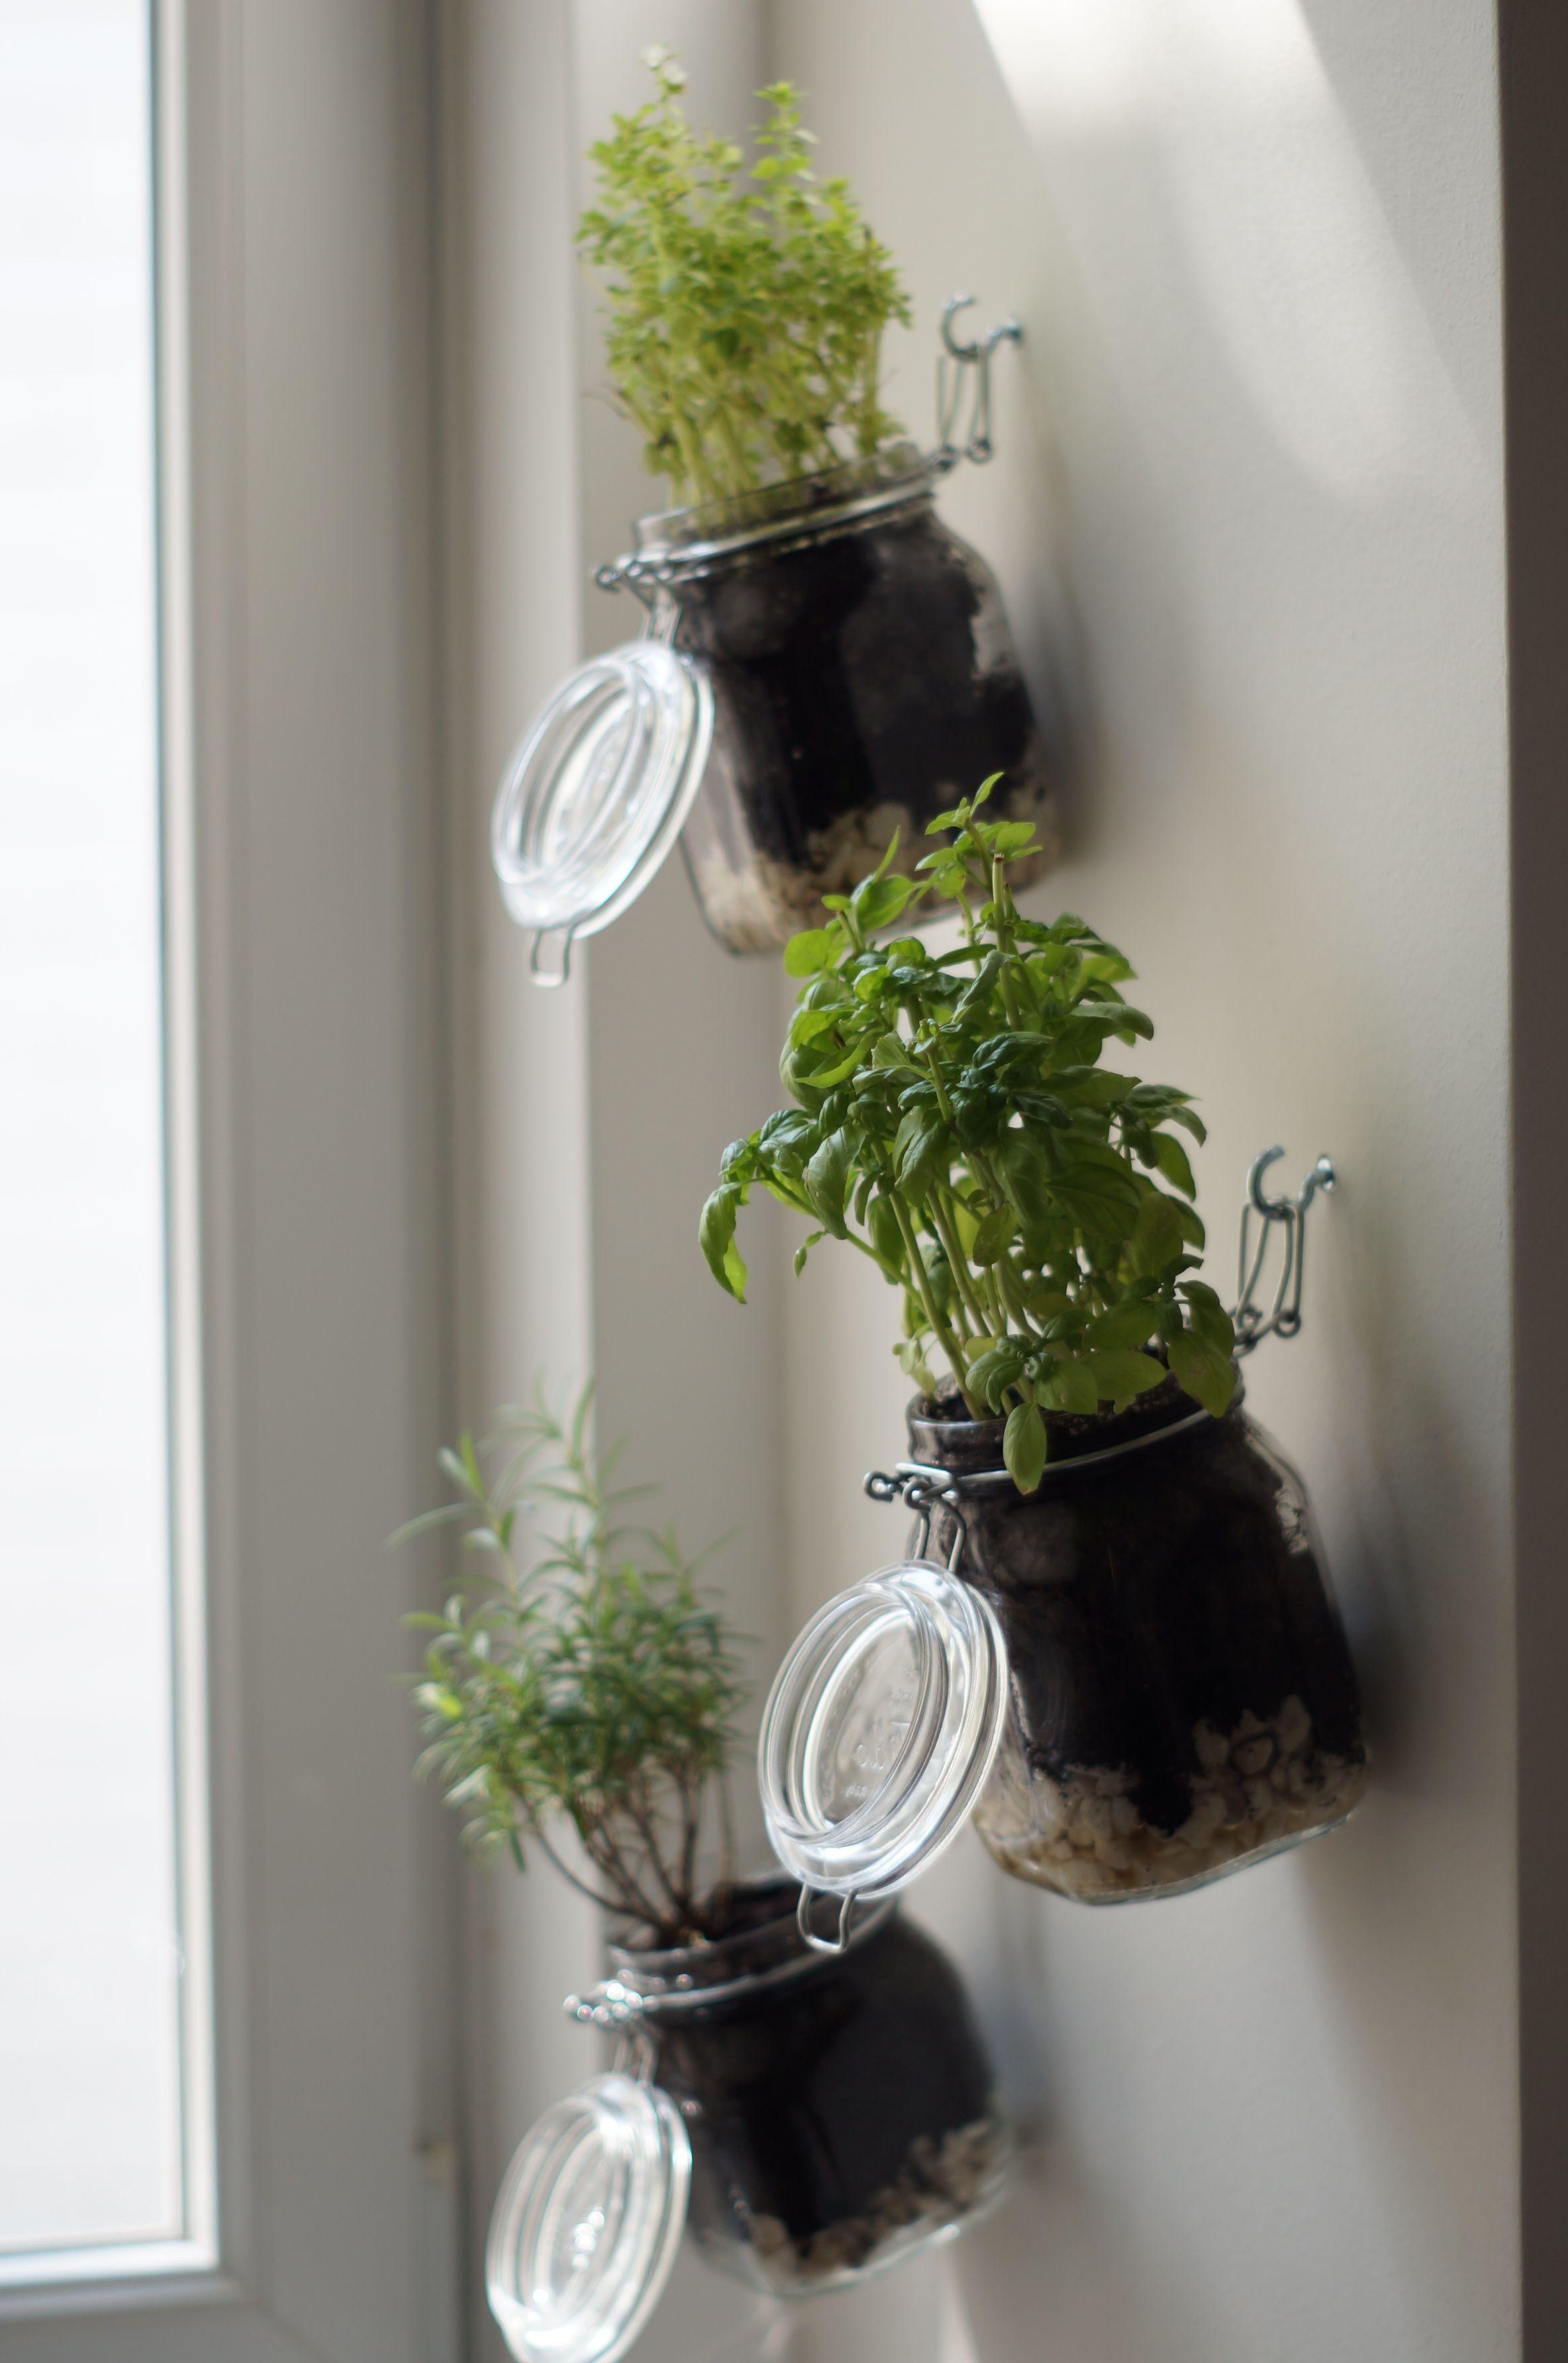 DIY Indoor-Kräutergarten: Schritt für Schritt Anleitung –